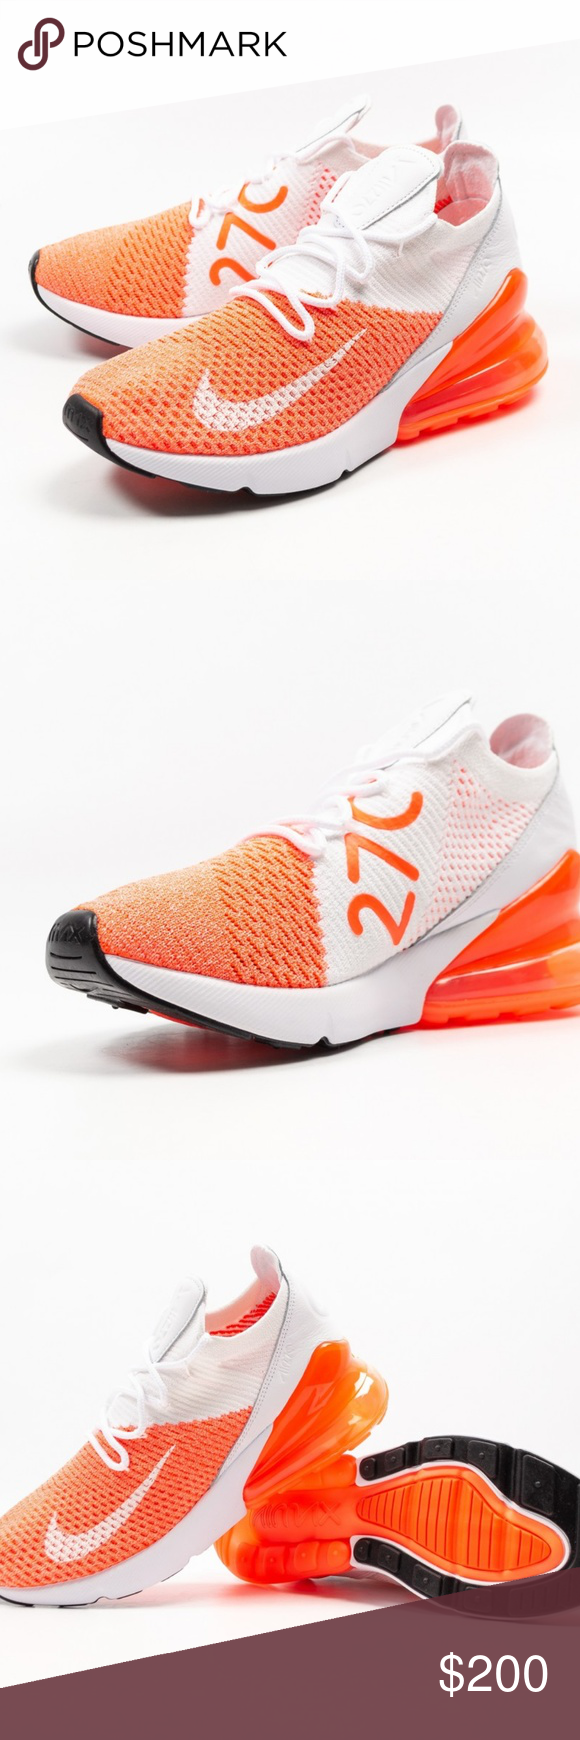 more photos 06f93 9b9c8 Nike Wmns Air Max 270 Flyknit Crimson Pulse sz10 Brand New ...